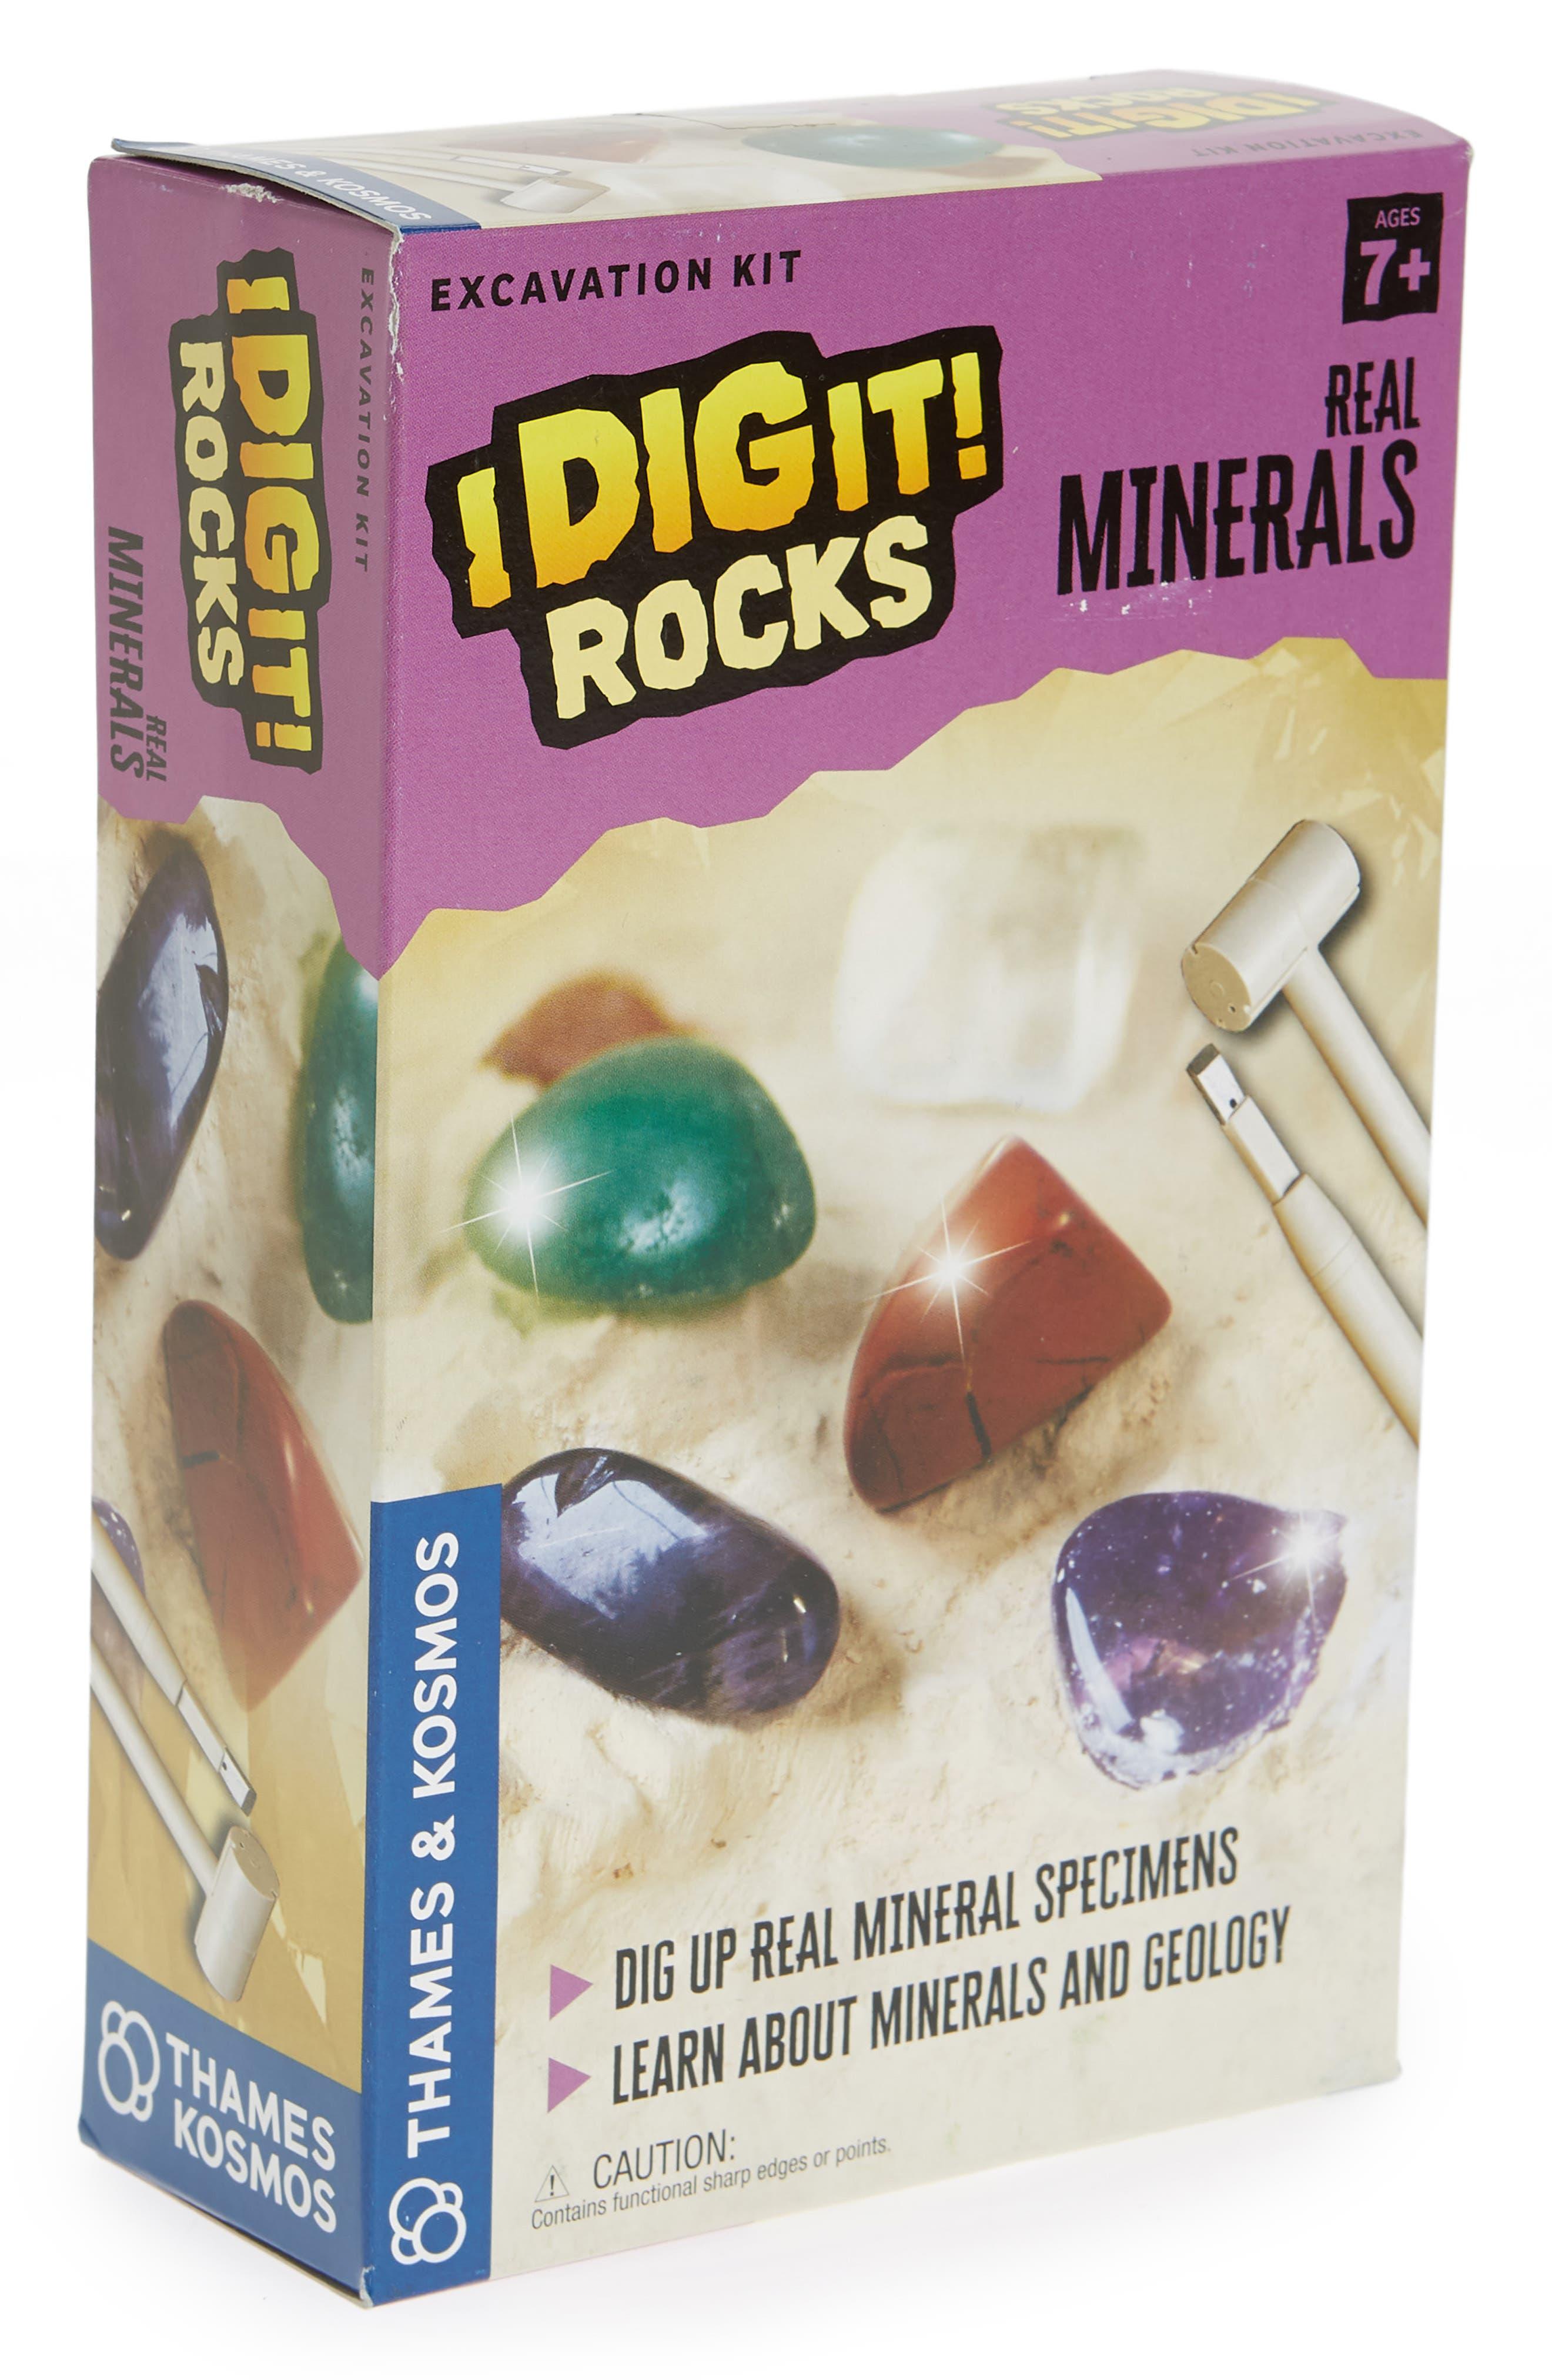 Thames & Kosmos I Dig It! Real Minerals Excavation Kit